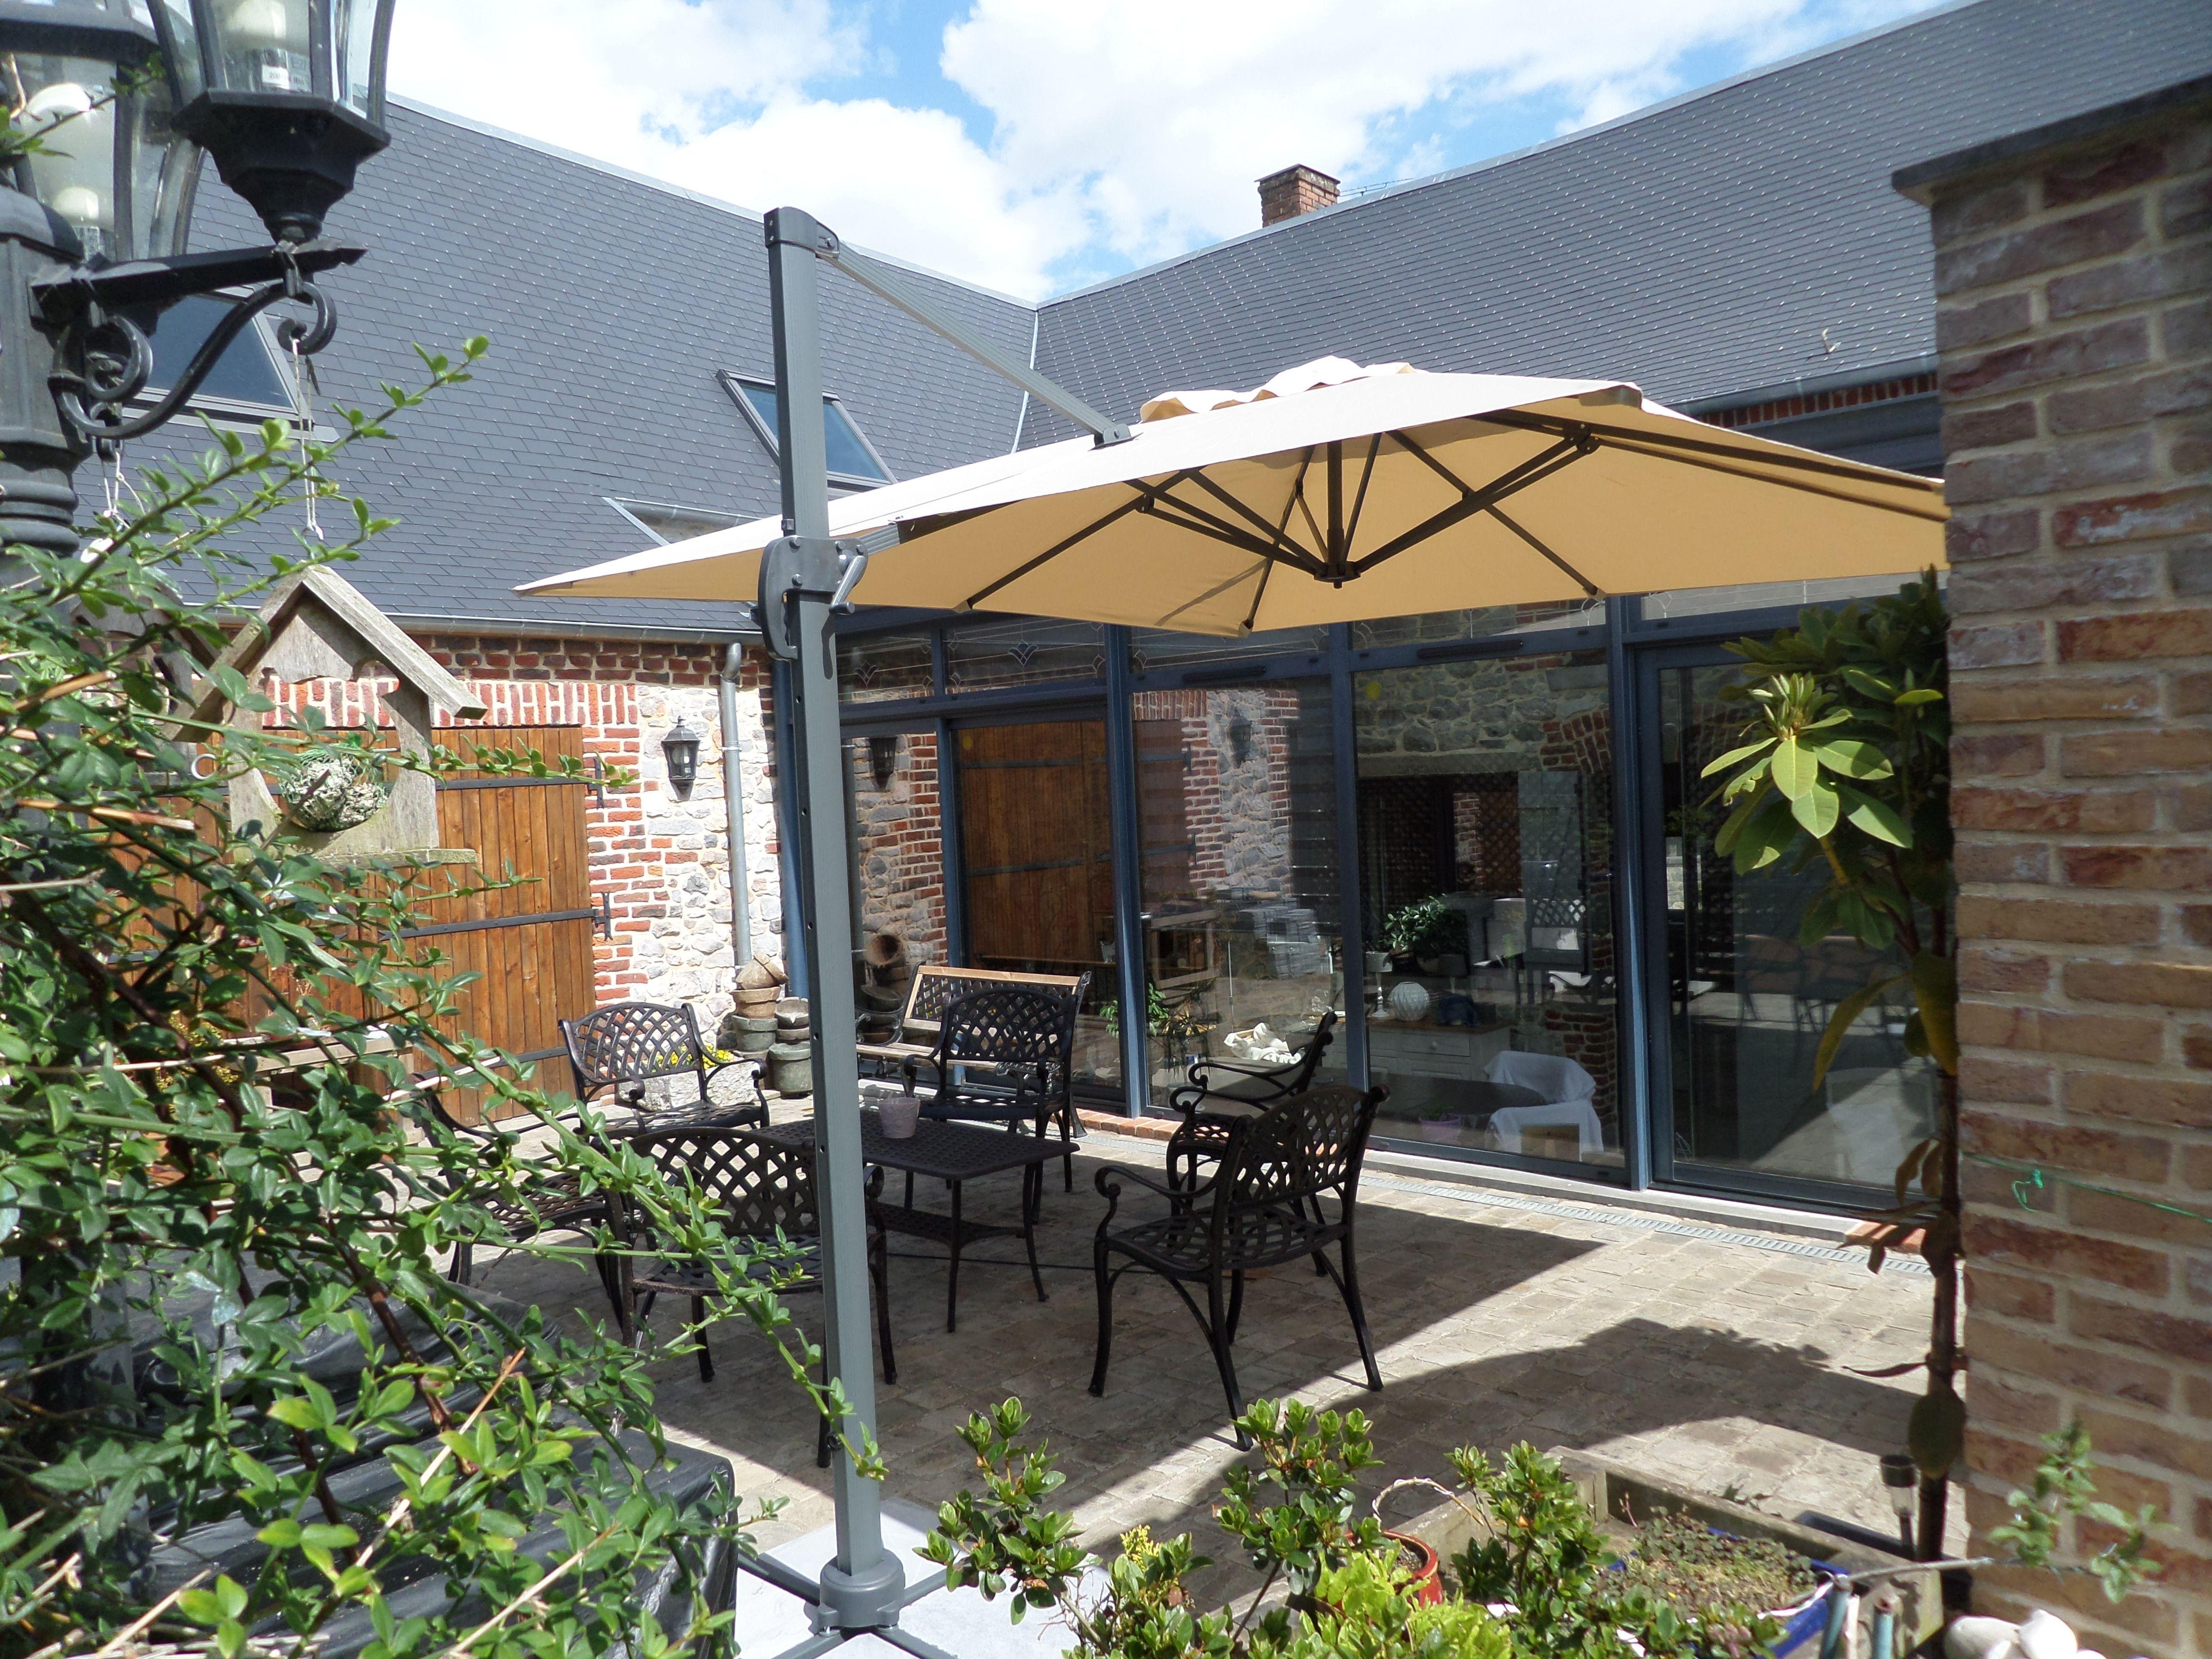 falgos parasol d port carr de 3x3m alice 39 s garden structure robuste en aluminium. Black Bedroom Furniture Sets. Home Design Ideas